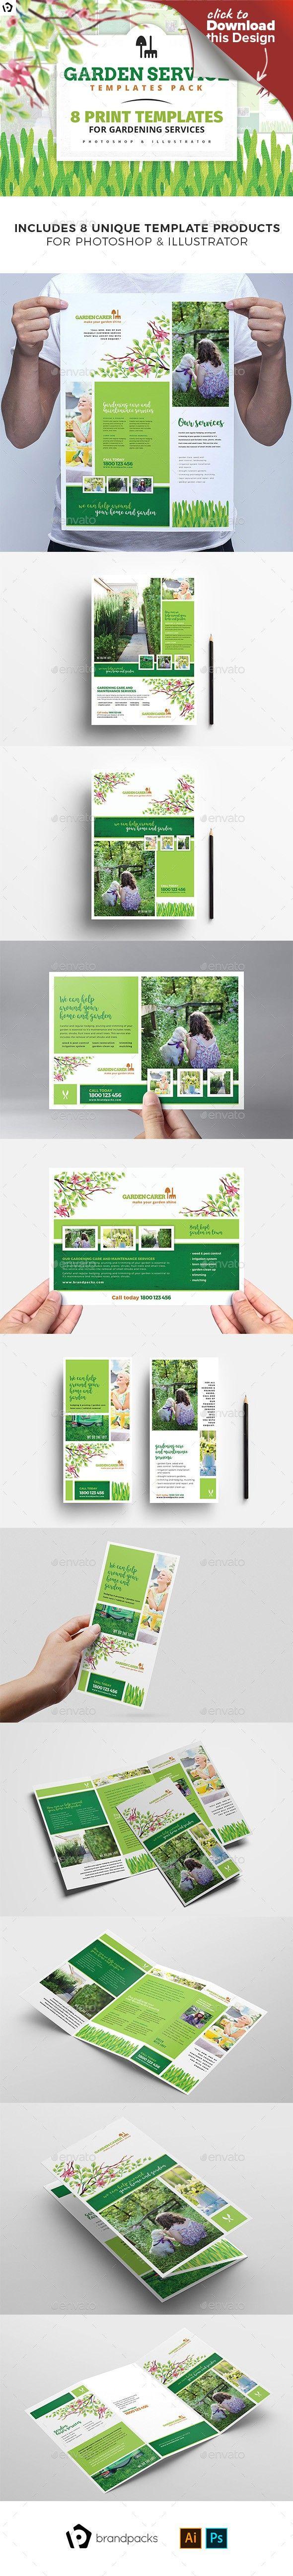 Gardener Templates Bundle Adobe Photoshop Adobe Illustrator And